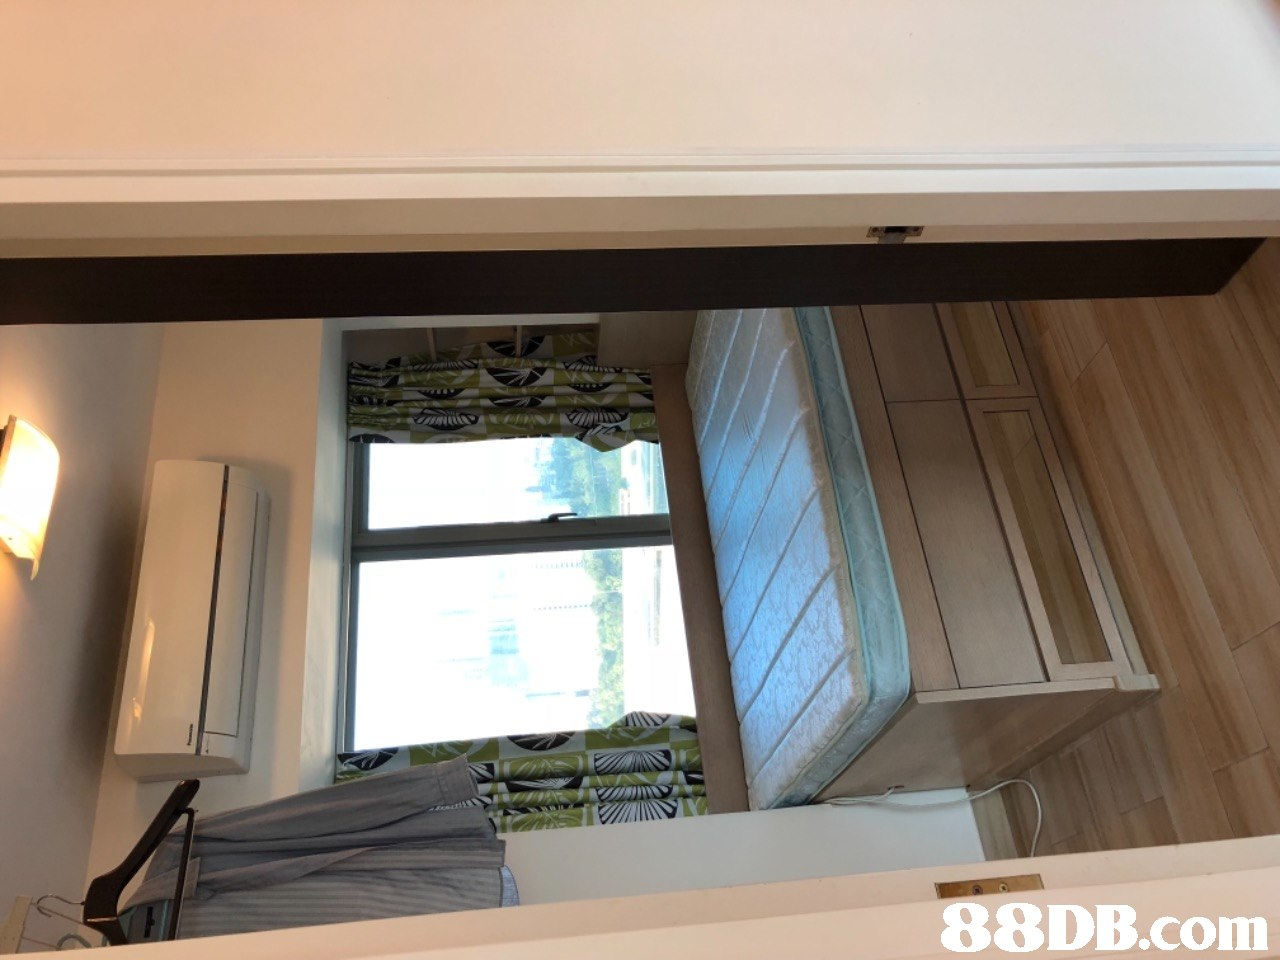 property,room,window,interior design,real estate